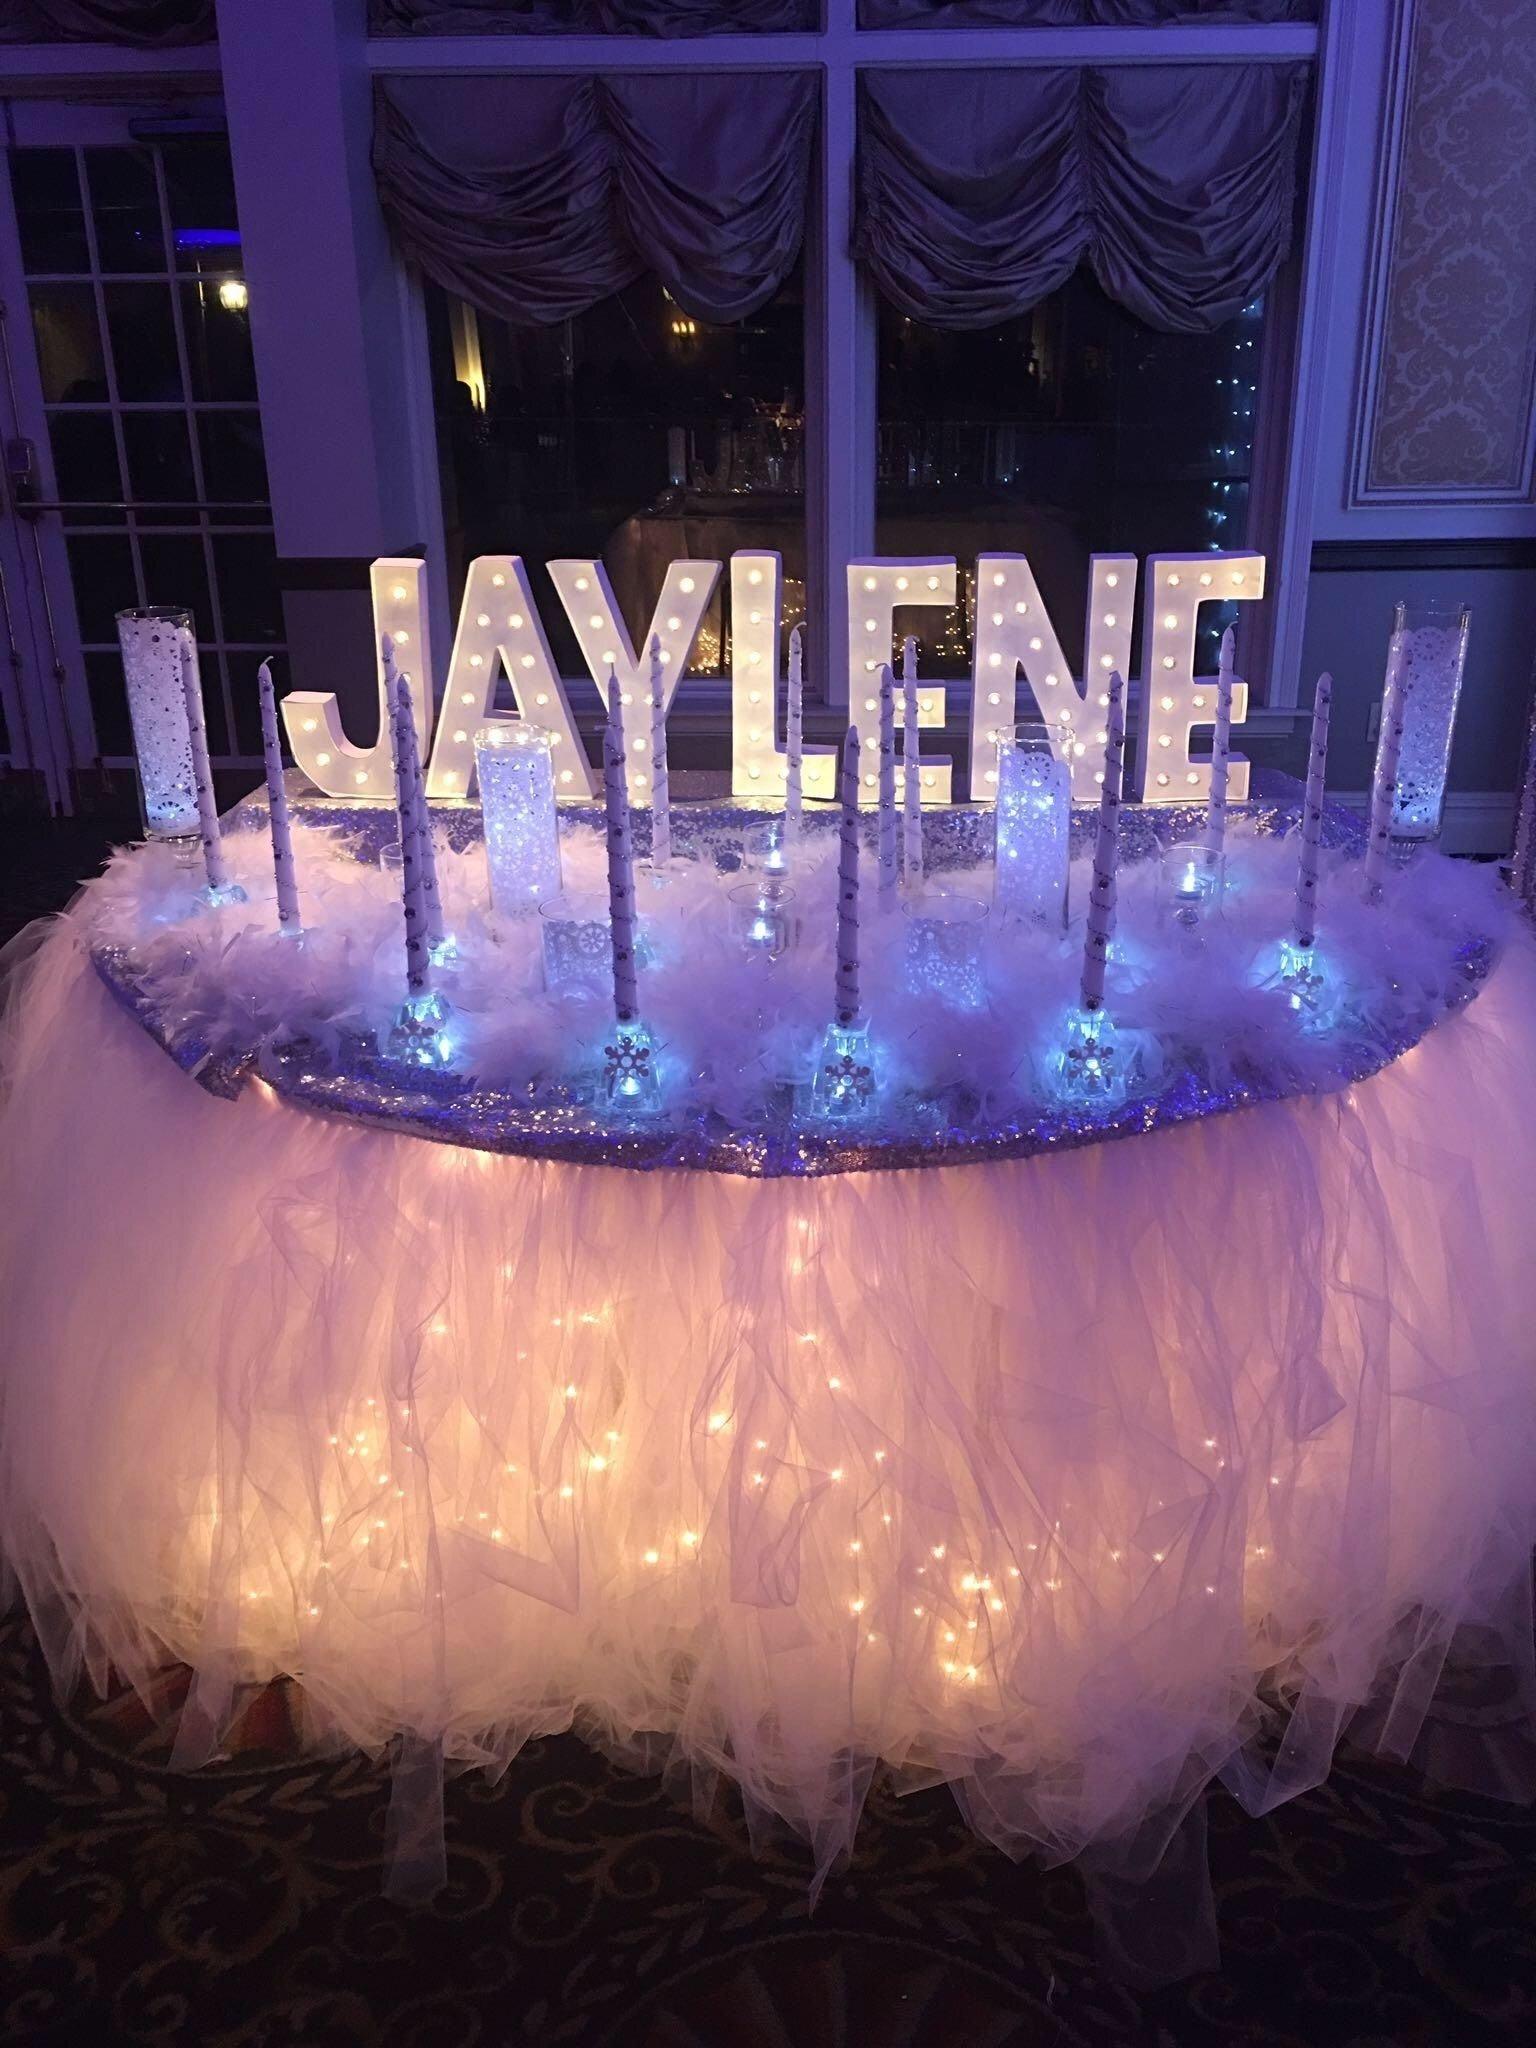 10 Amazing Sweet 16 Party Ideas Pinterest candle ceremony set up winter wonderland sweet 16 winter